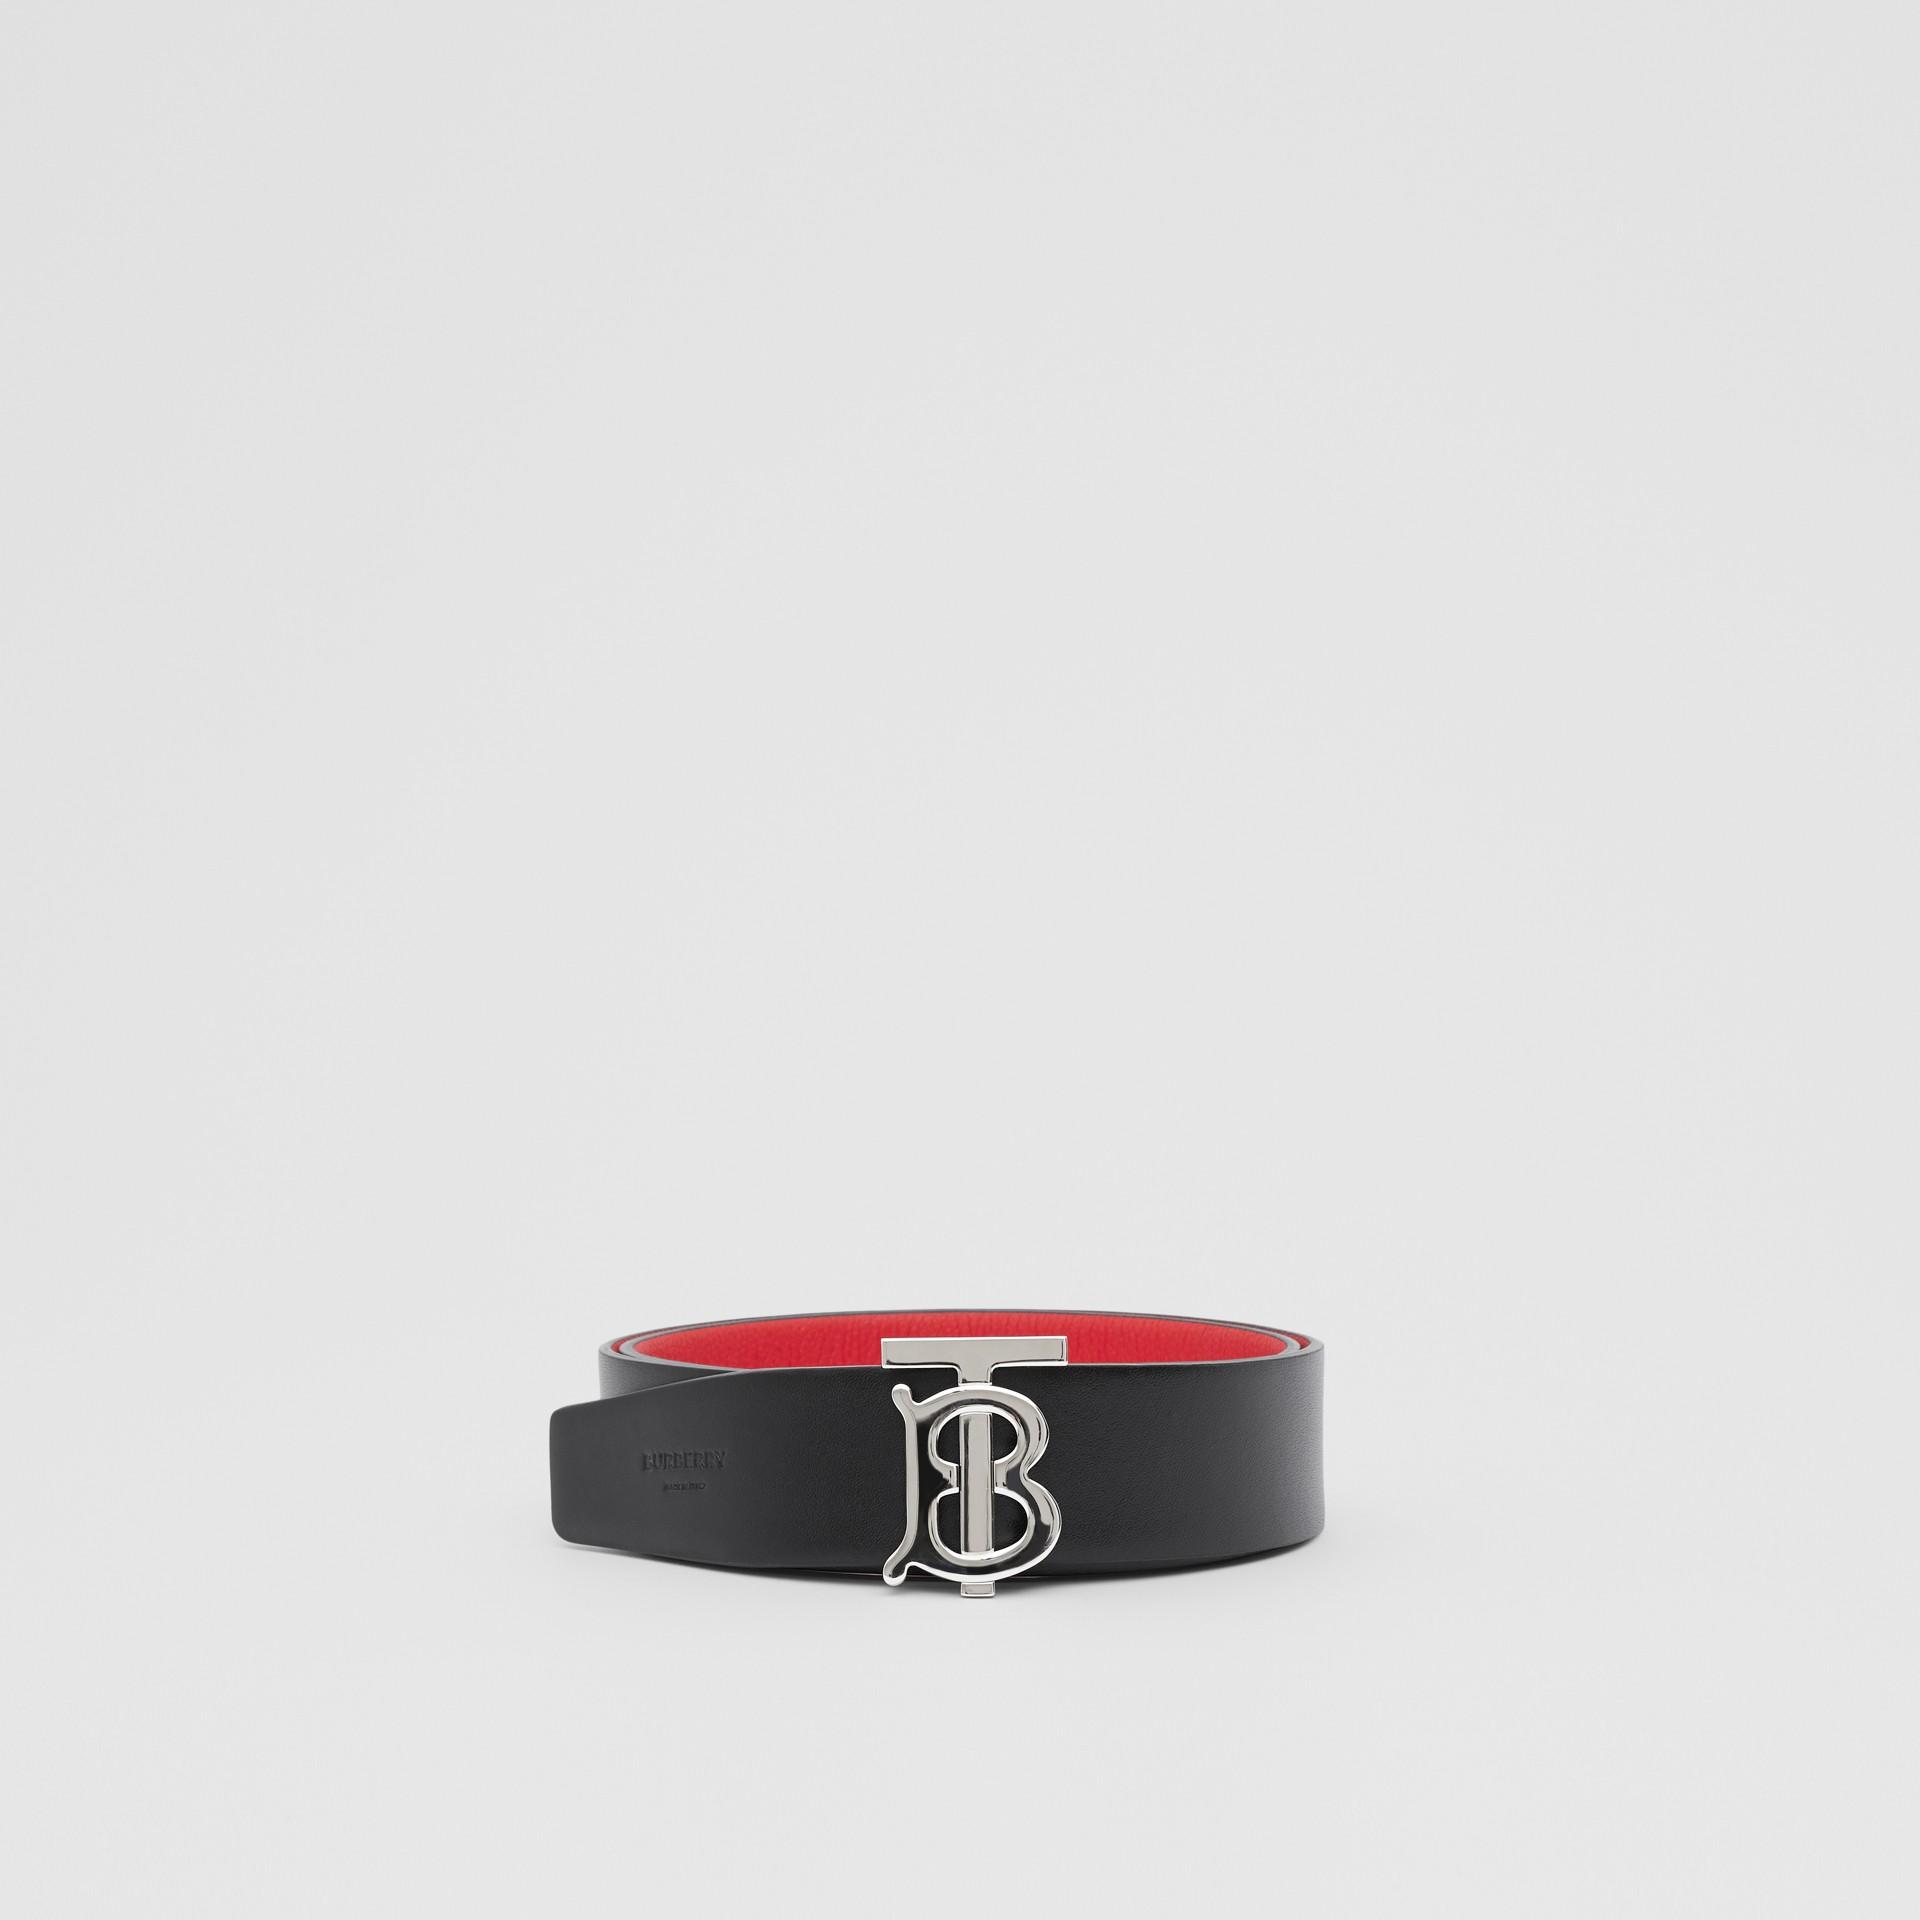 Reversible Monogram Motif Grainy Leather Belt in Military Red/black - Men | Burberry United Kingdom - gallery image 5